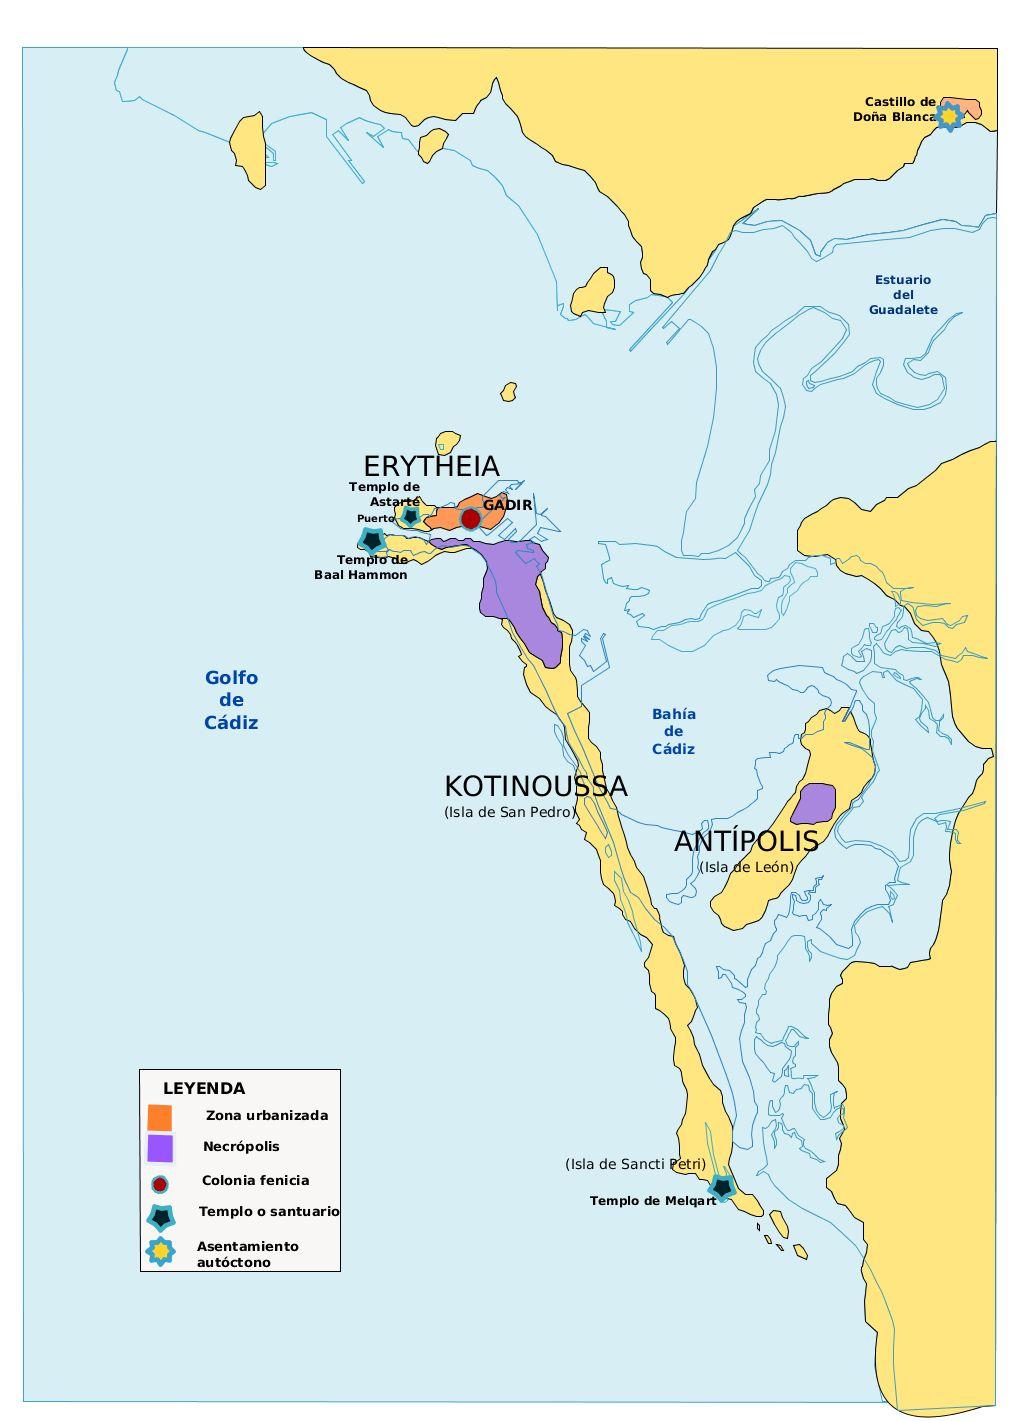 Gadeira Islands, 2000-3000 years ago